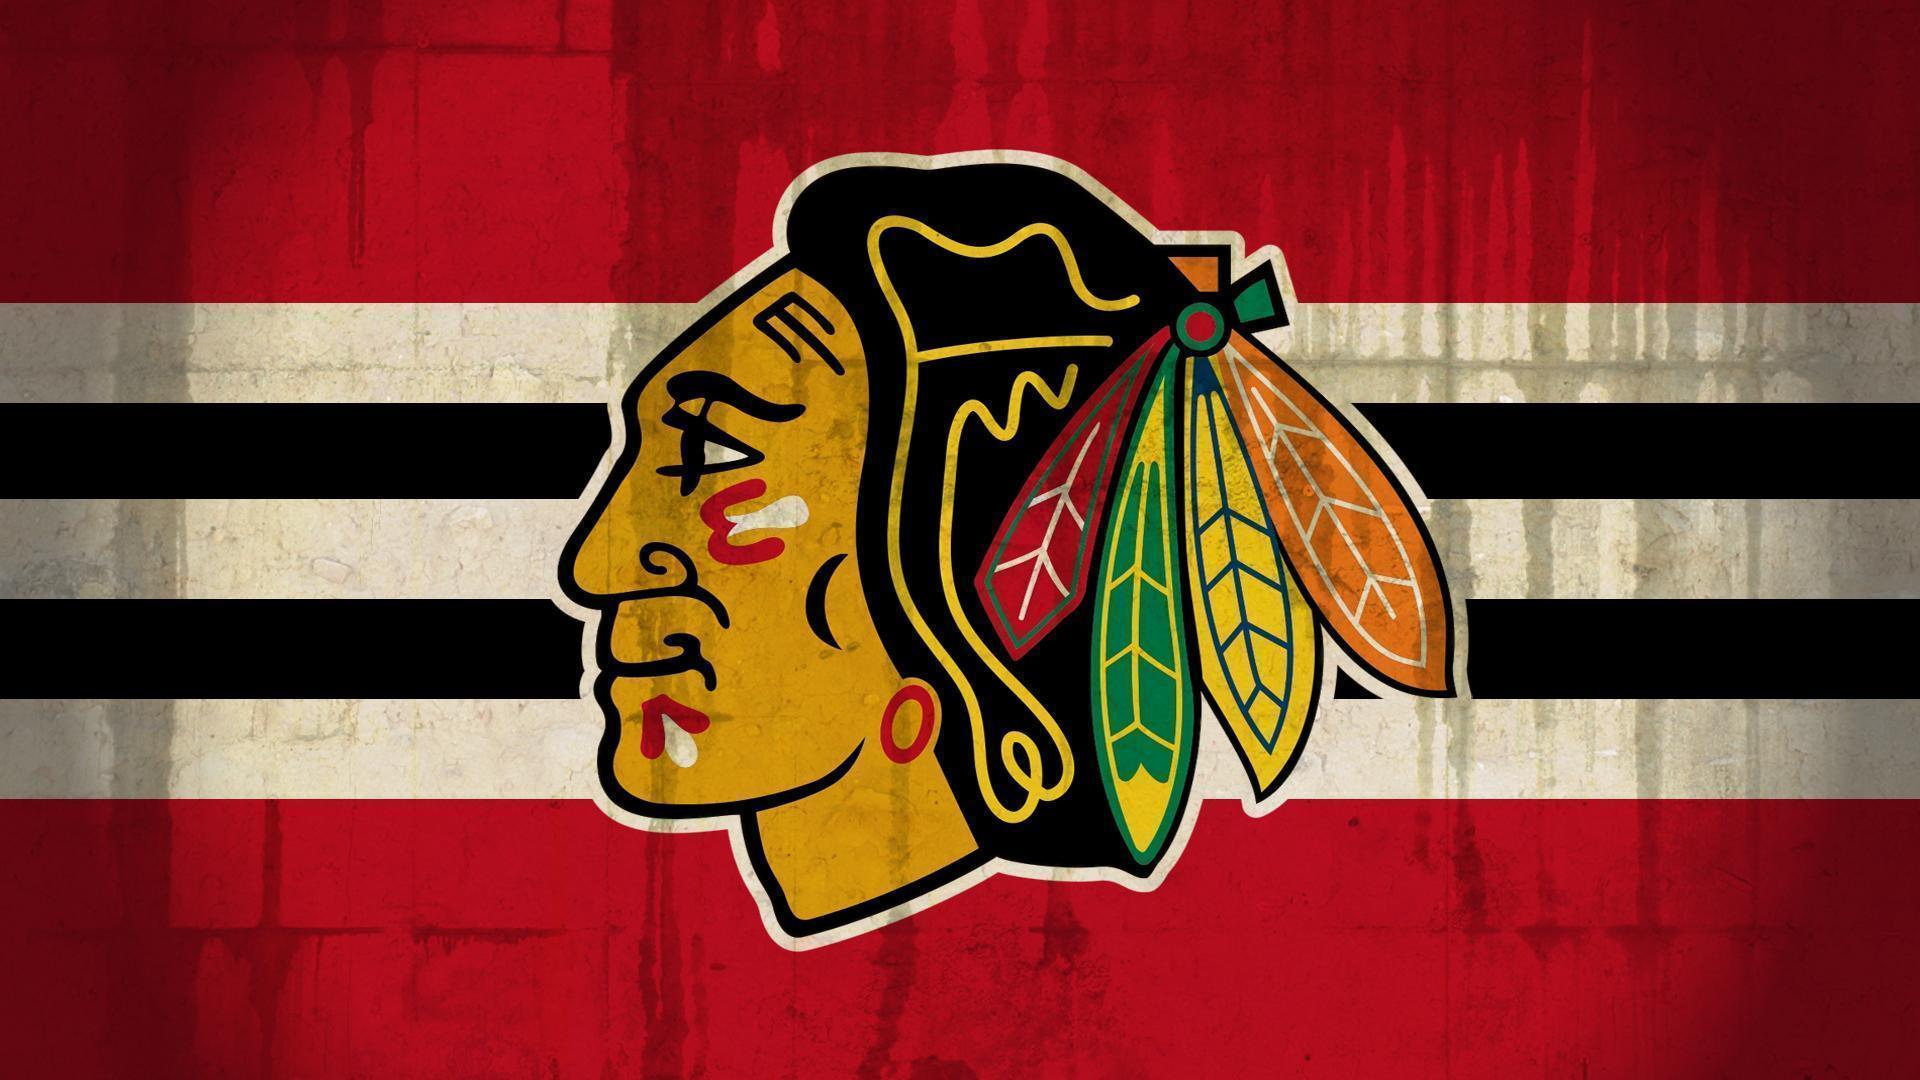 Free chicago blackhawks wallpapers wallpaper cave chicago blackhawks logo wallpaper voltagebd Images